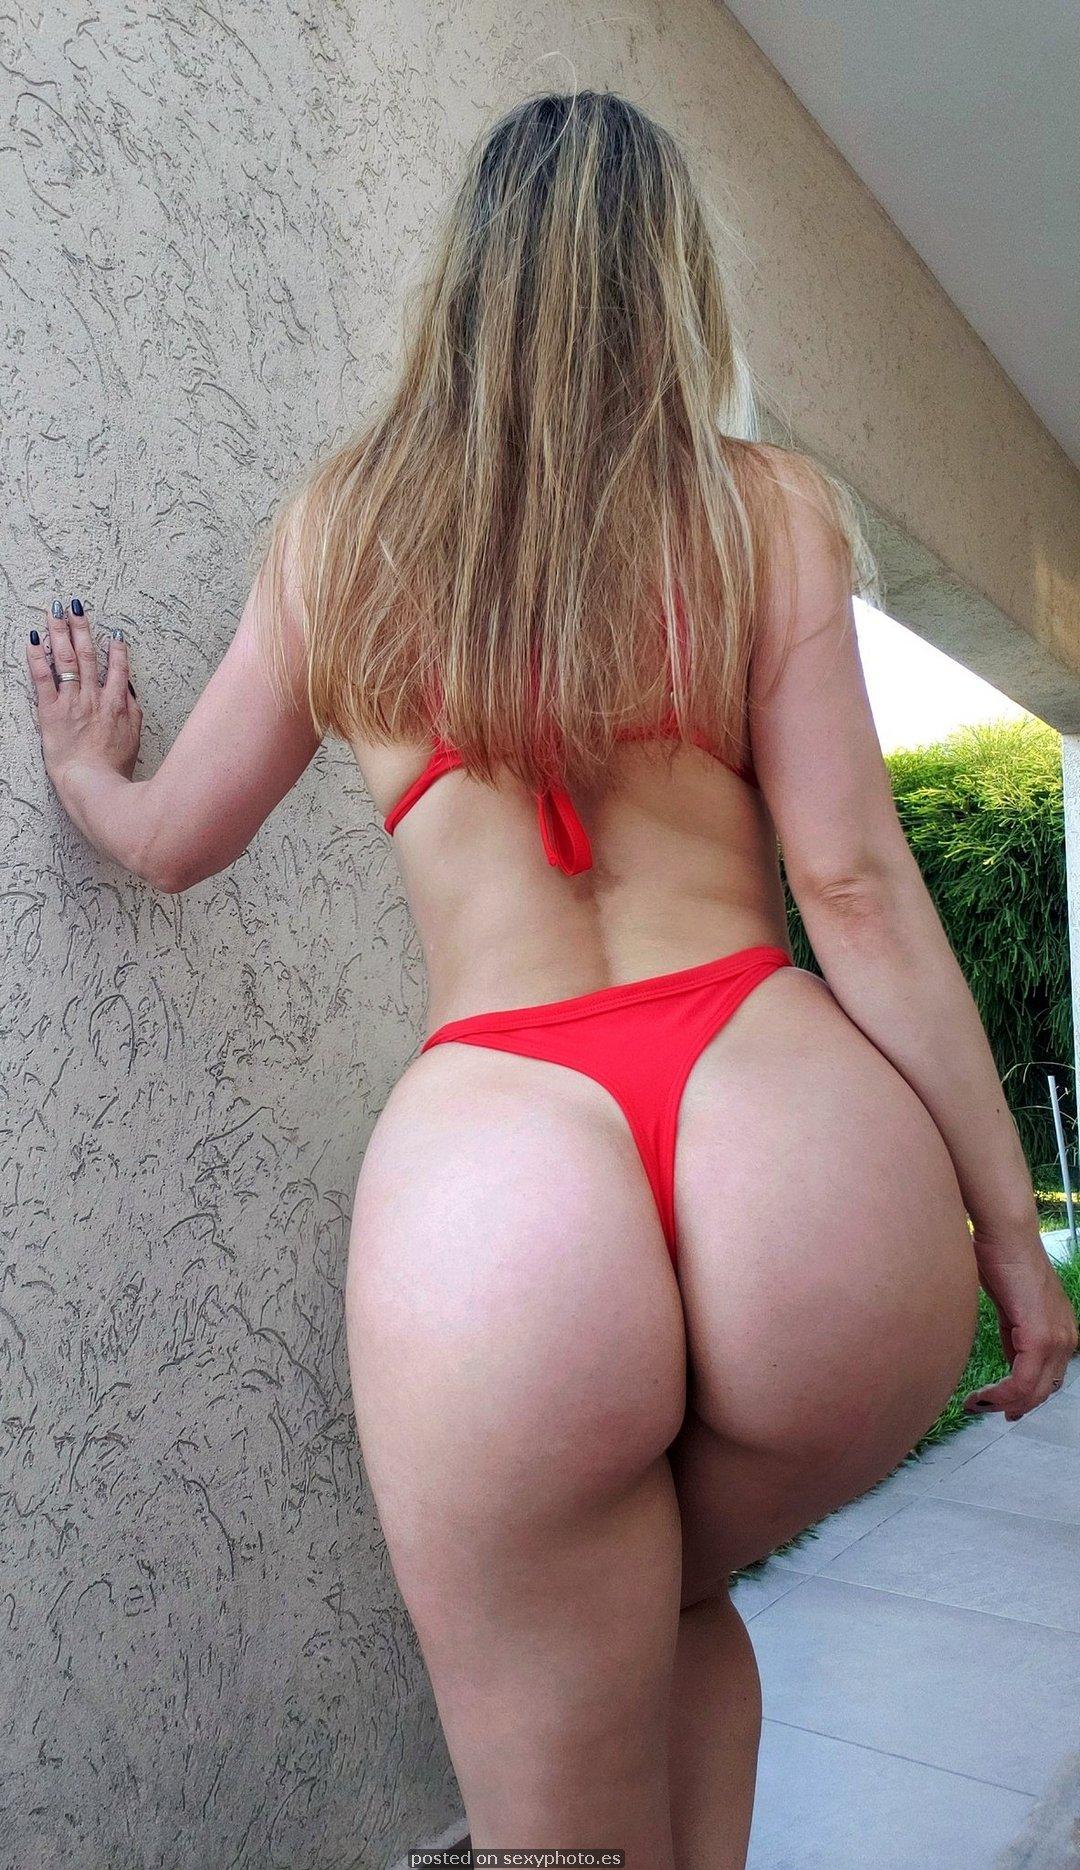 Victoria Vazquez model, Victoria Vazquez red bikini